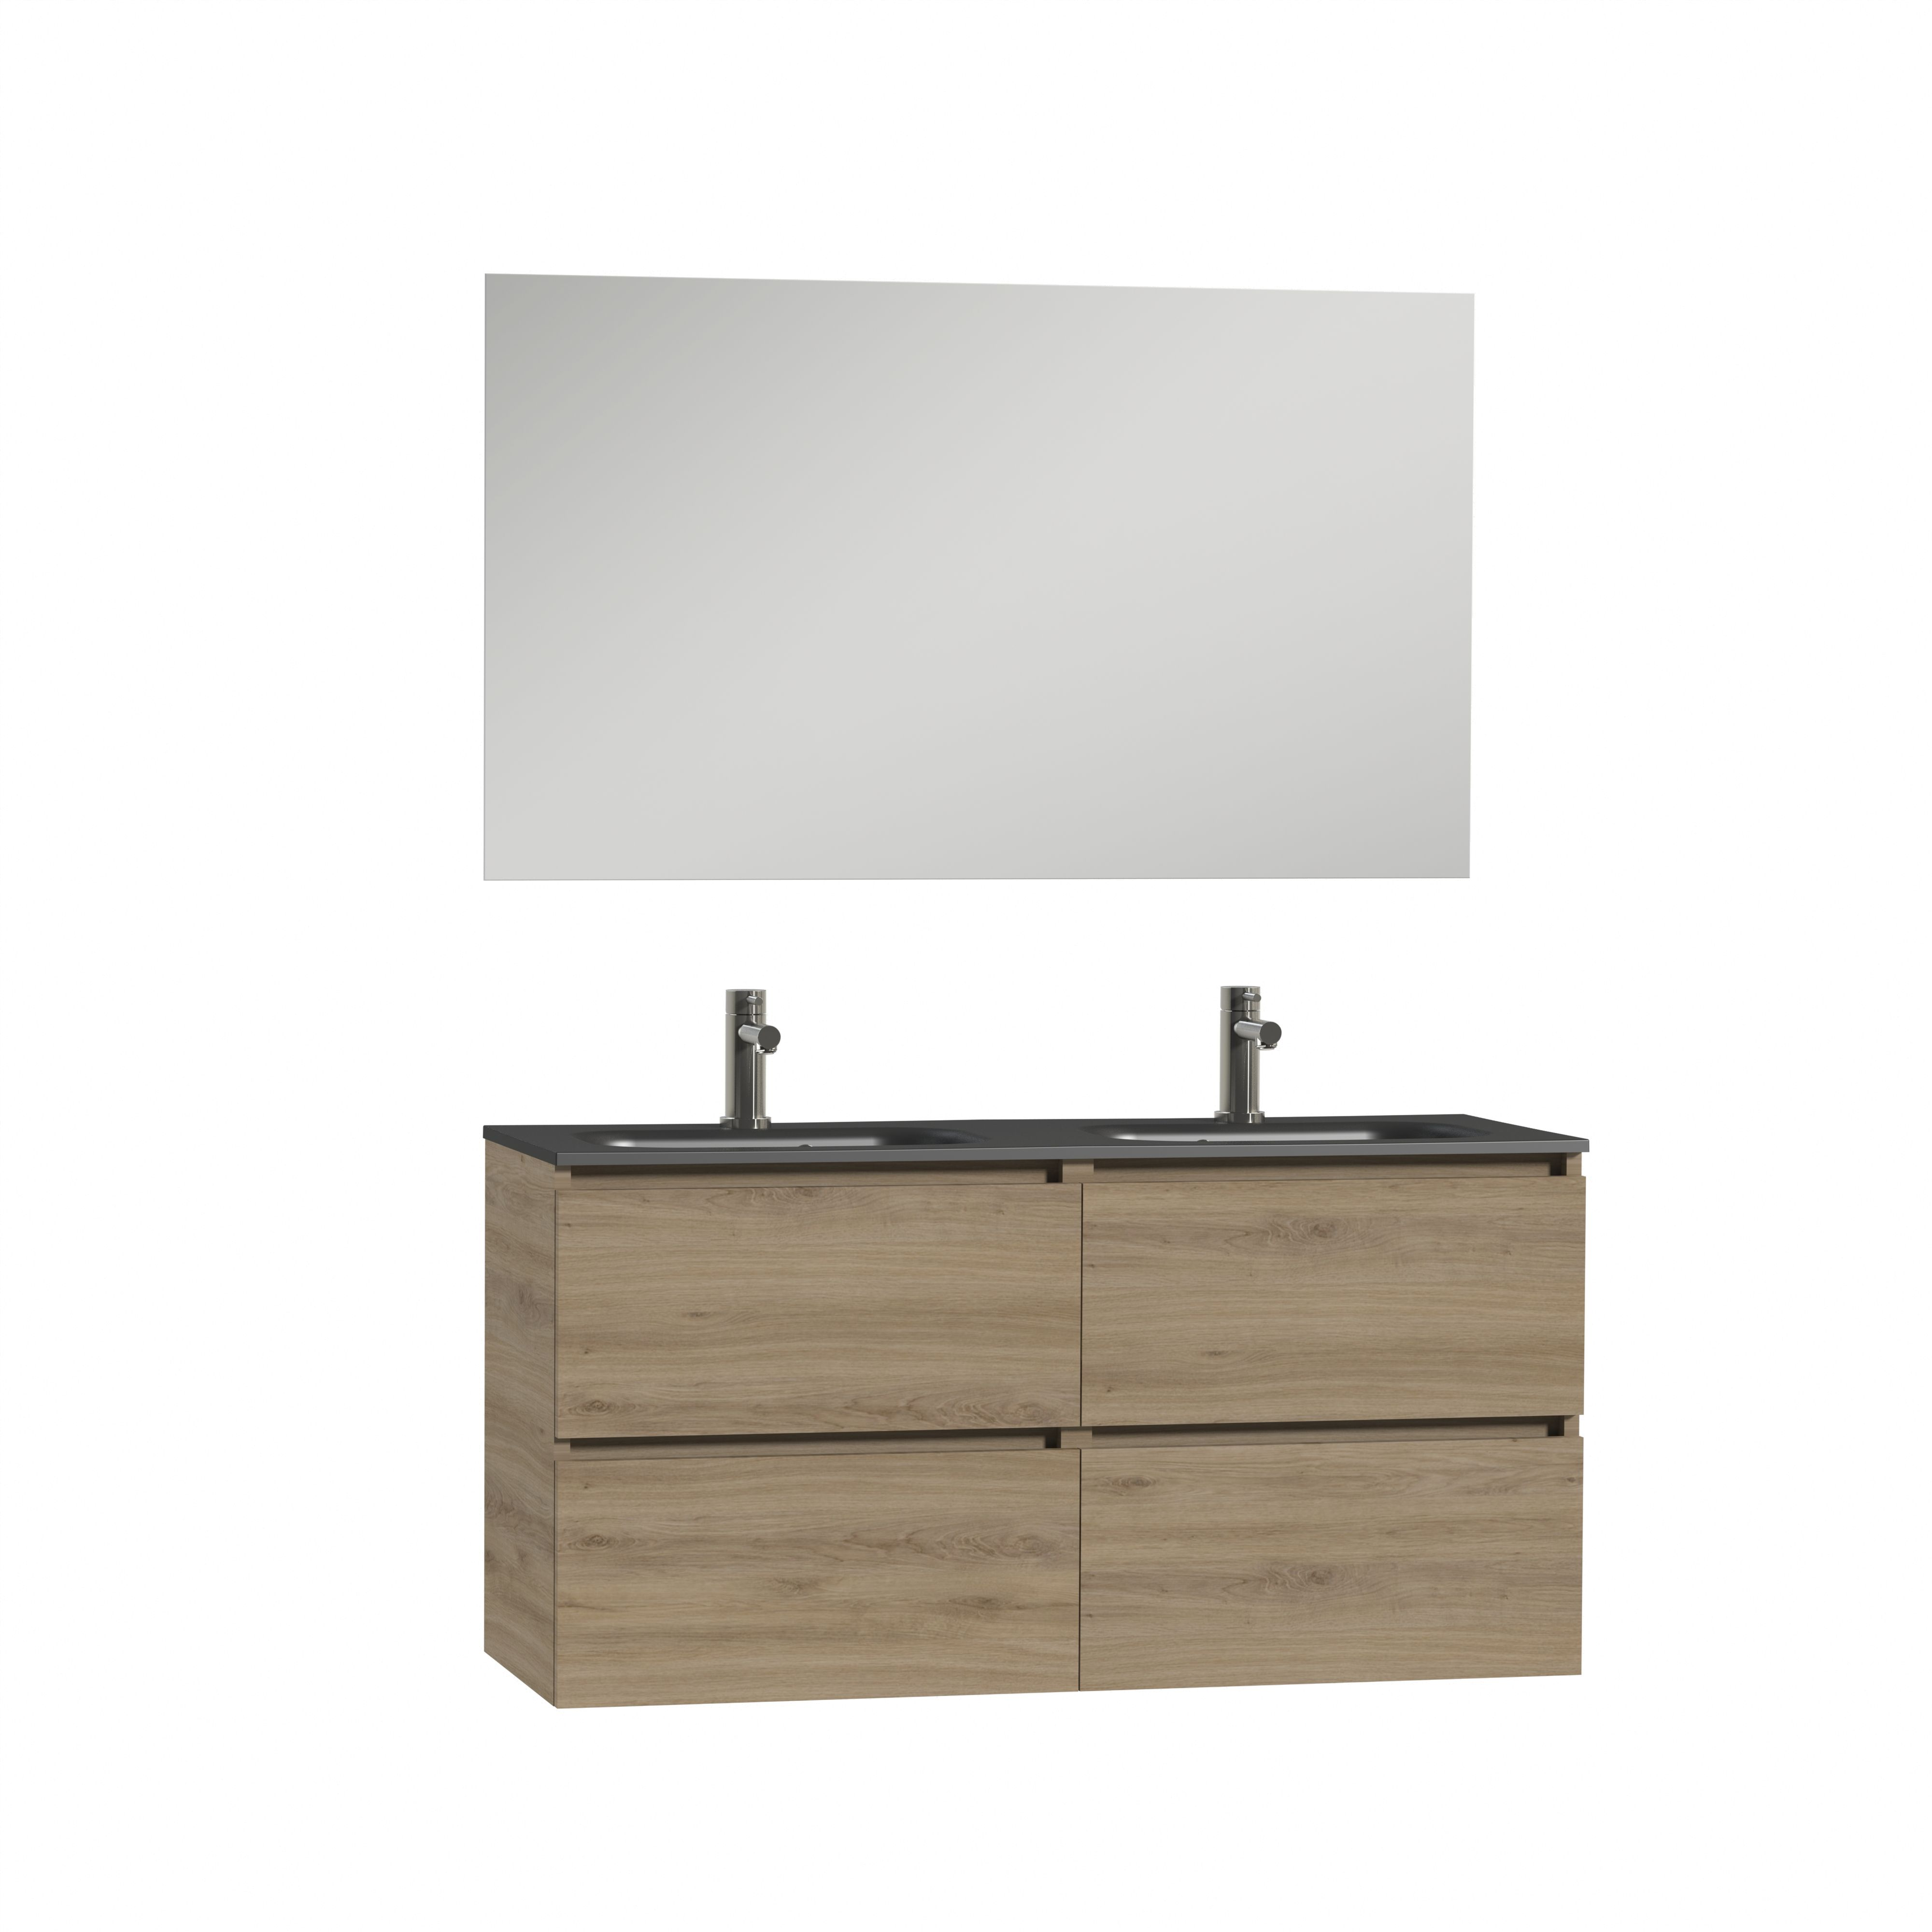 Tiger Loft dubbel badmeubel met spiegel en zwarte wastafel 120cm chalet eiken